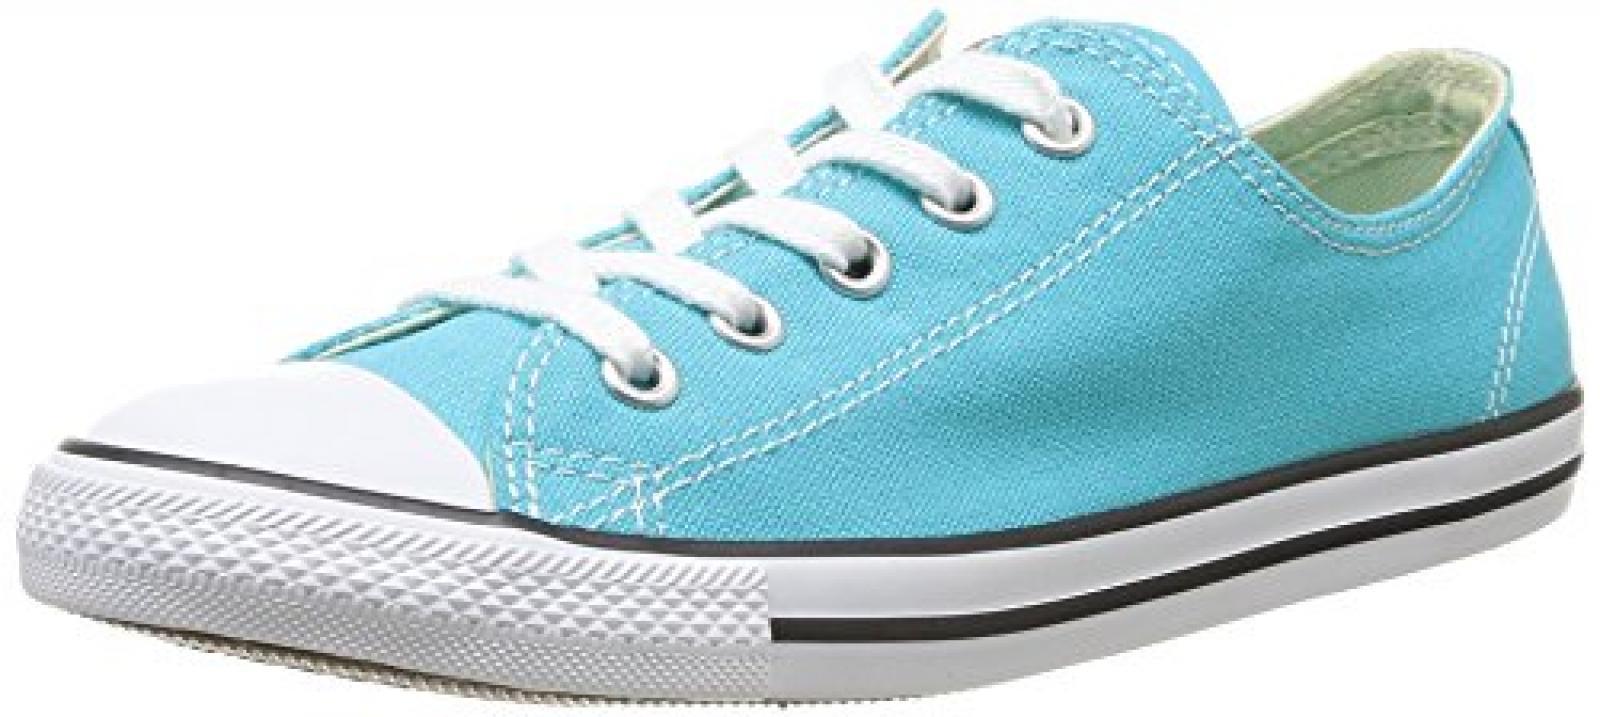 Converse All Star Dainty Ox, Unisex-Erwachsene Sneaker